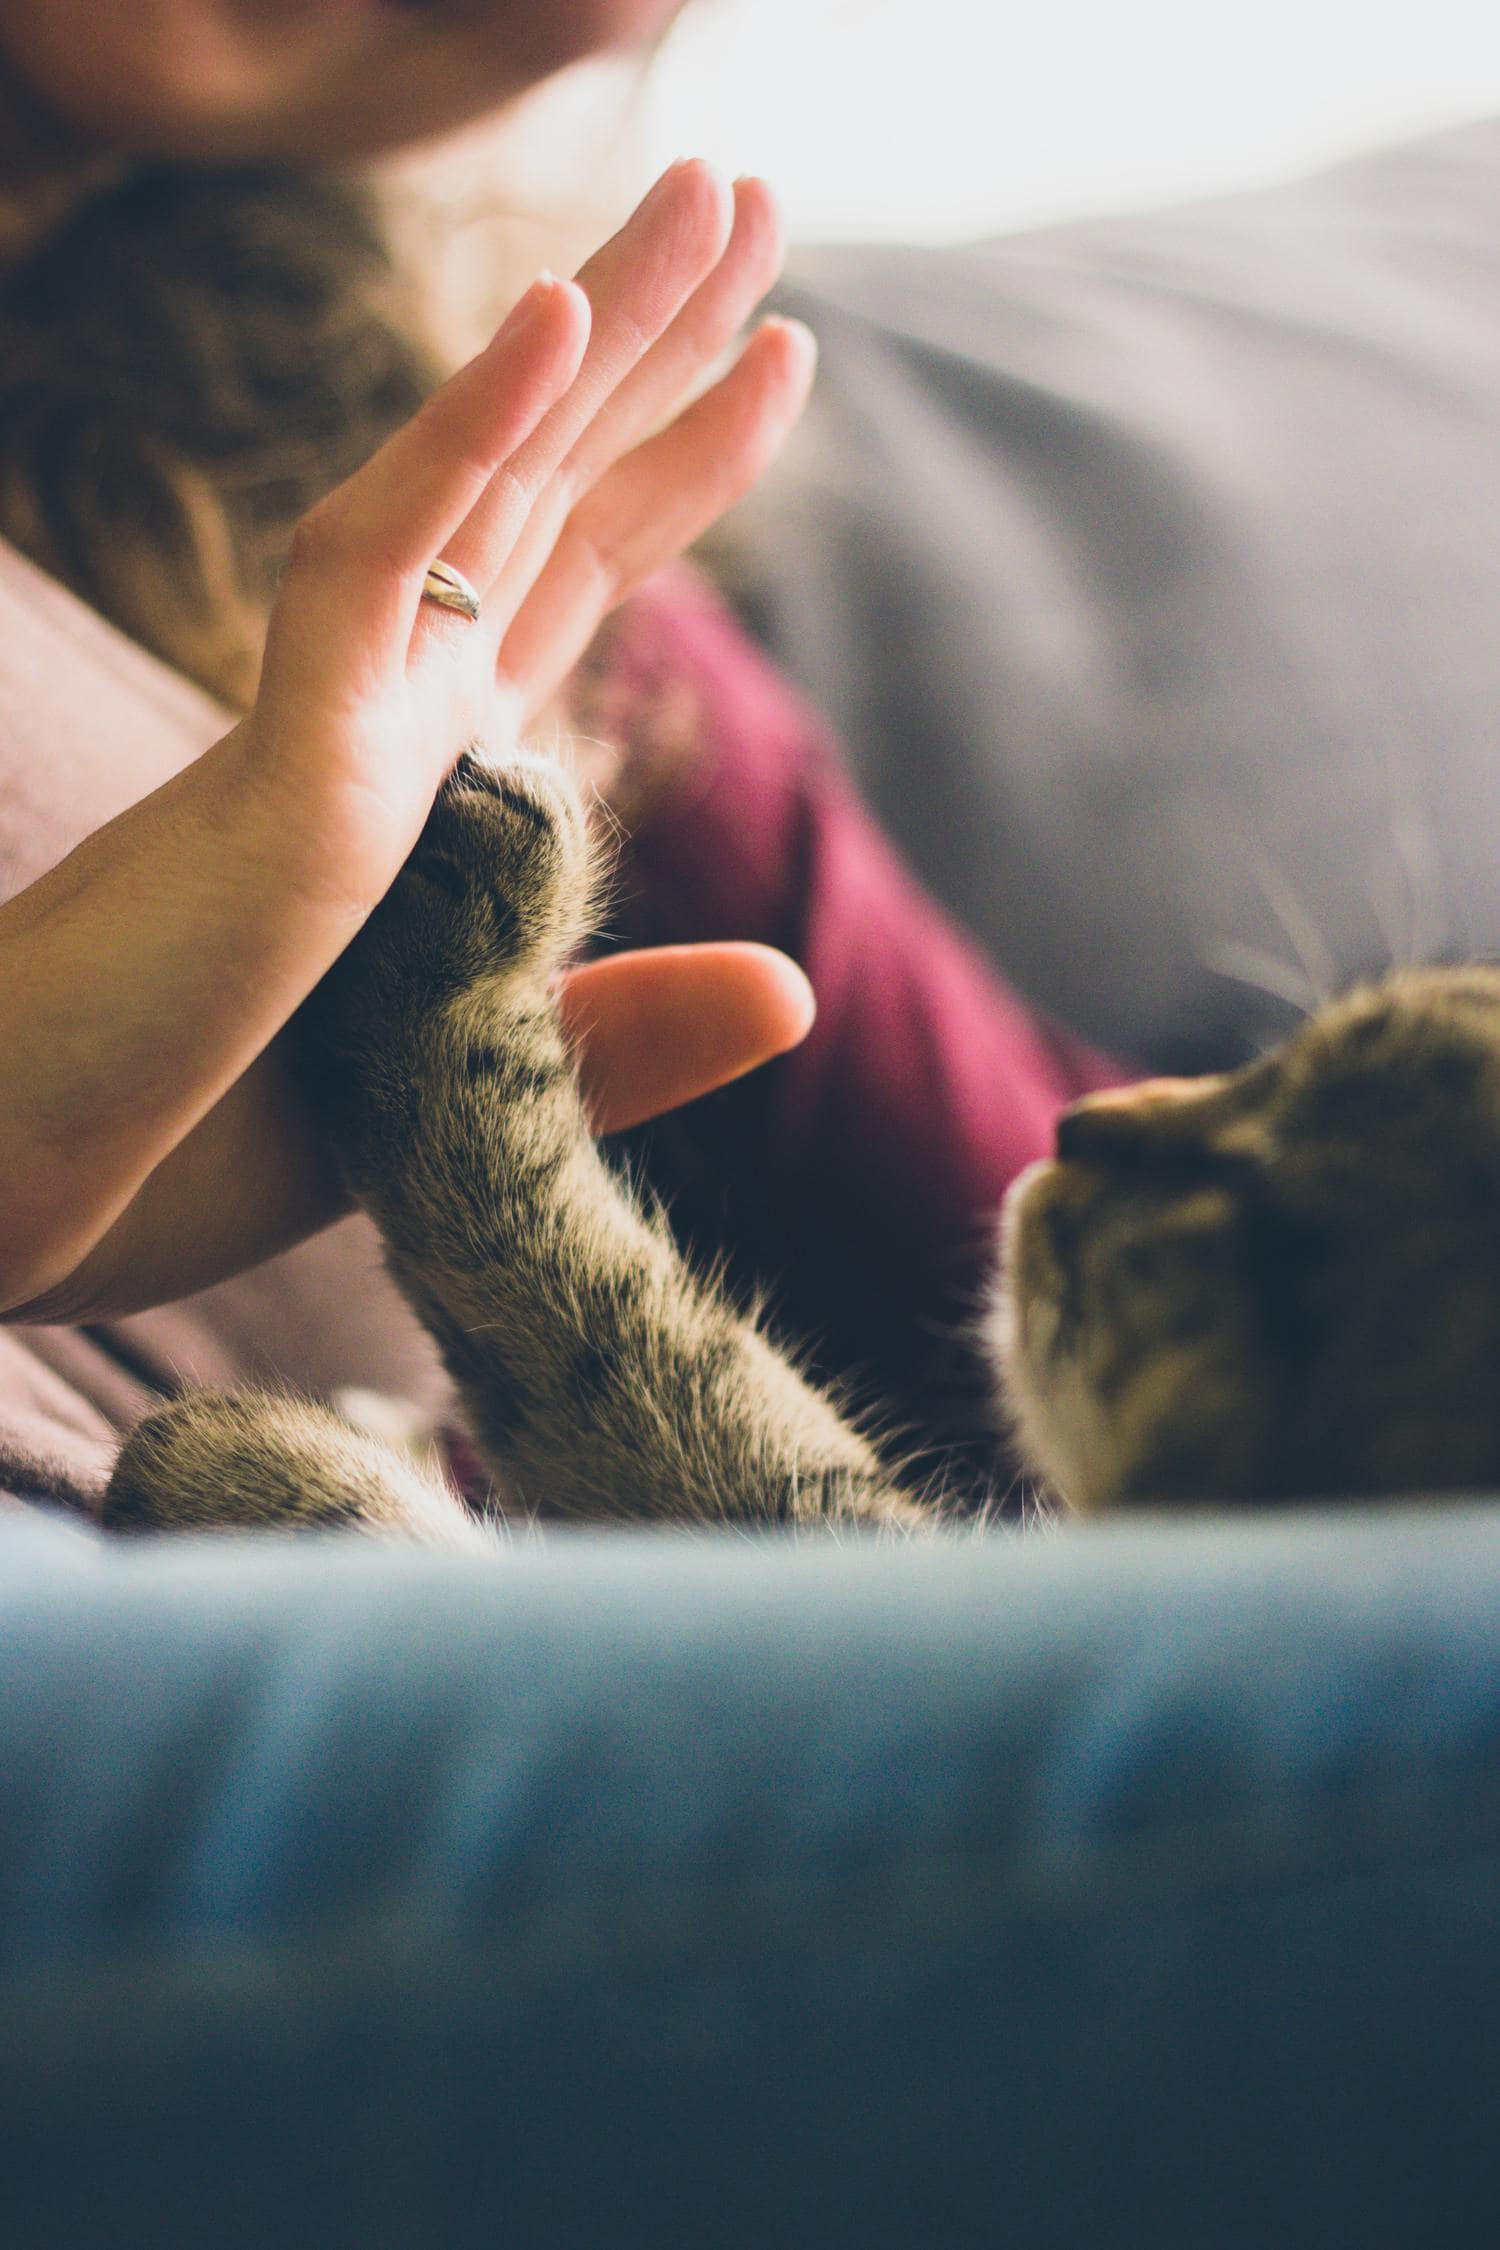 manos pata